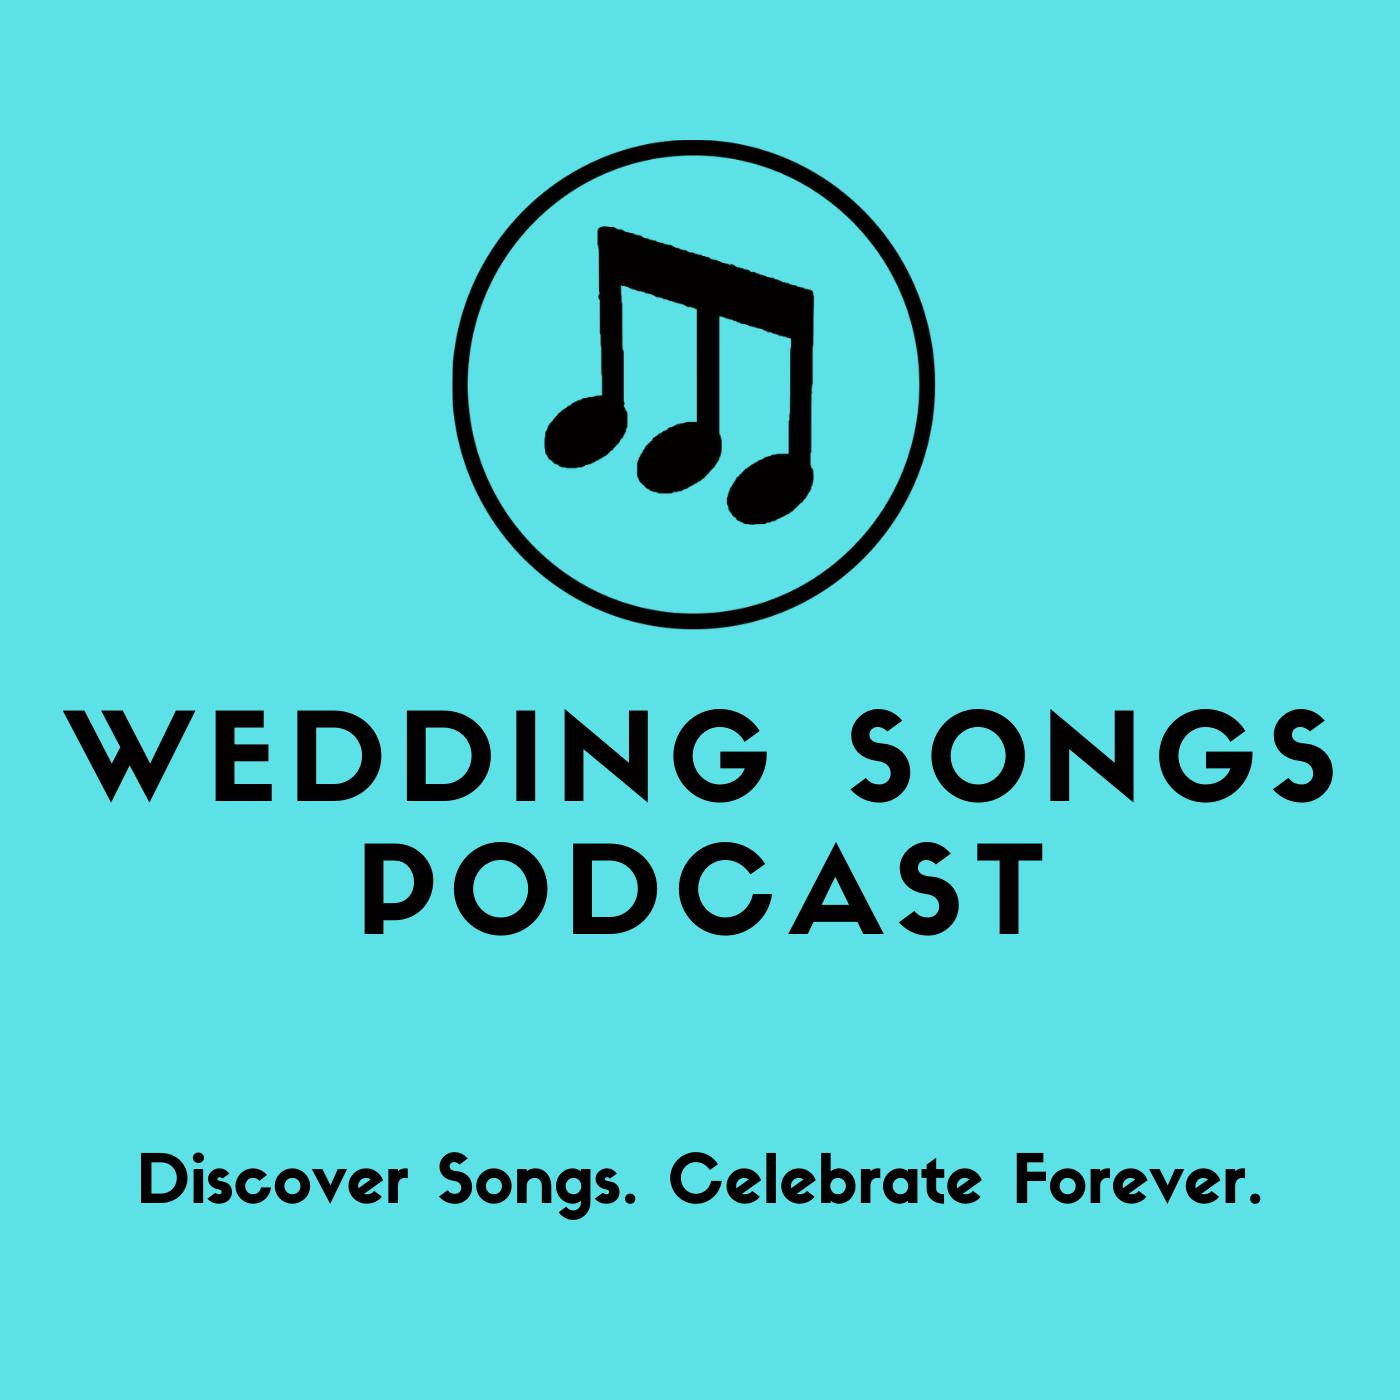 Wedding Songs Podcast